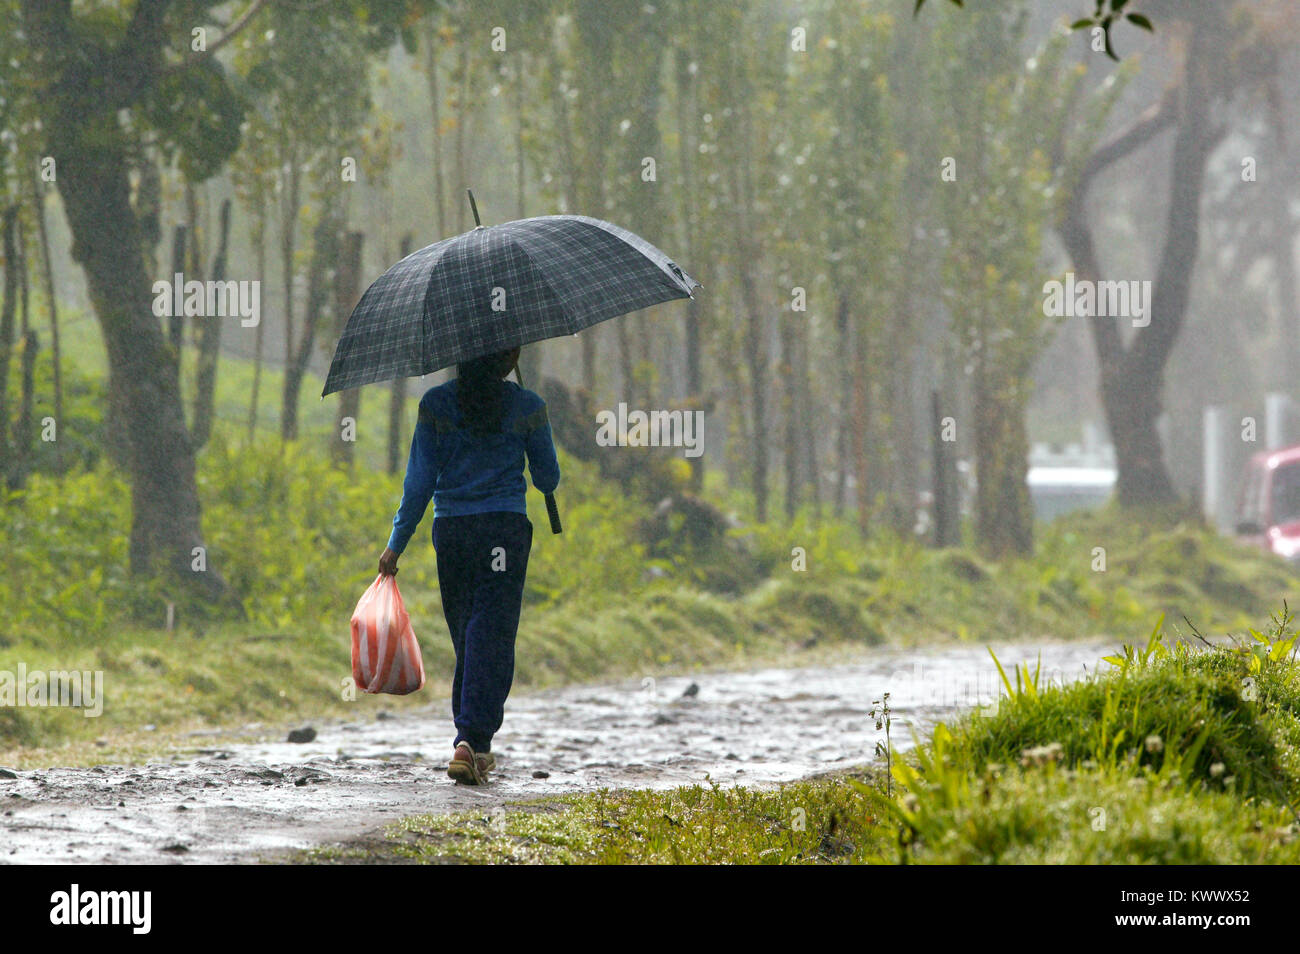 girl with umbrella on